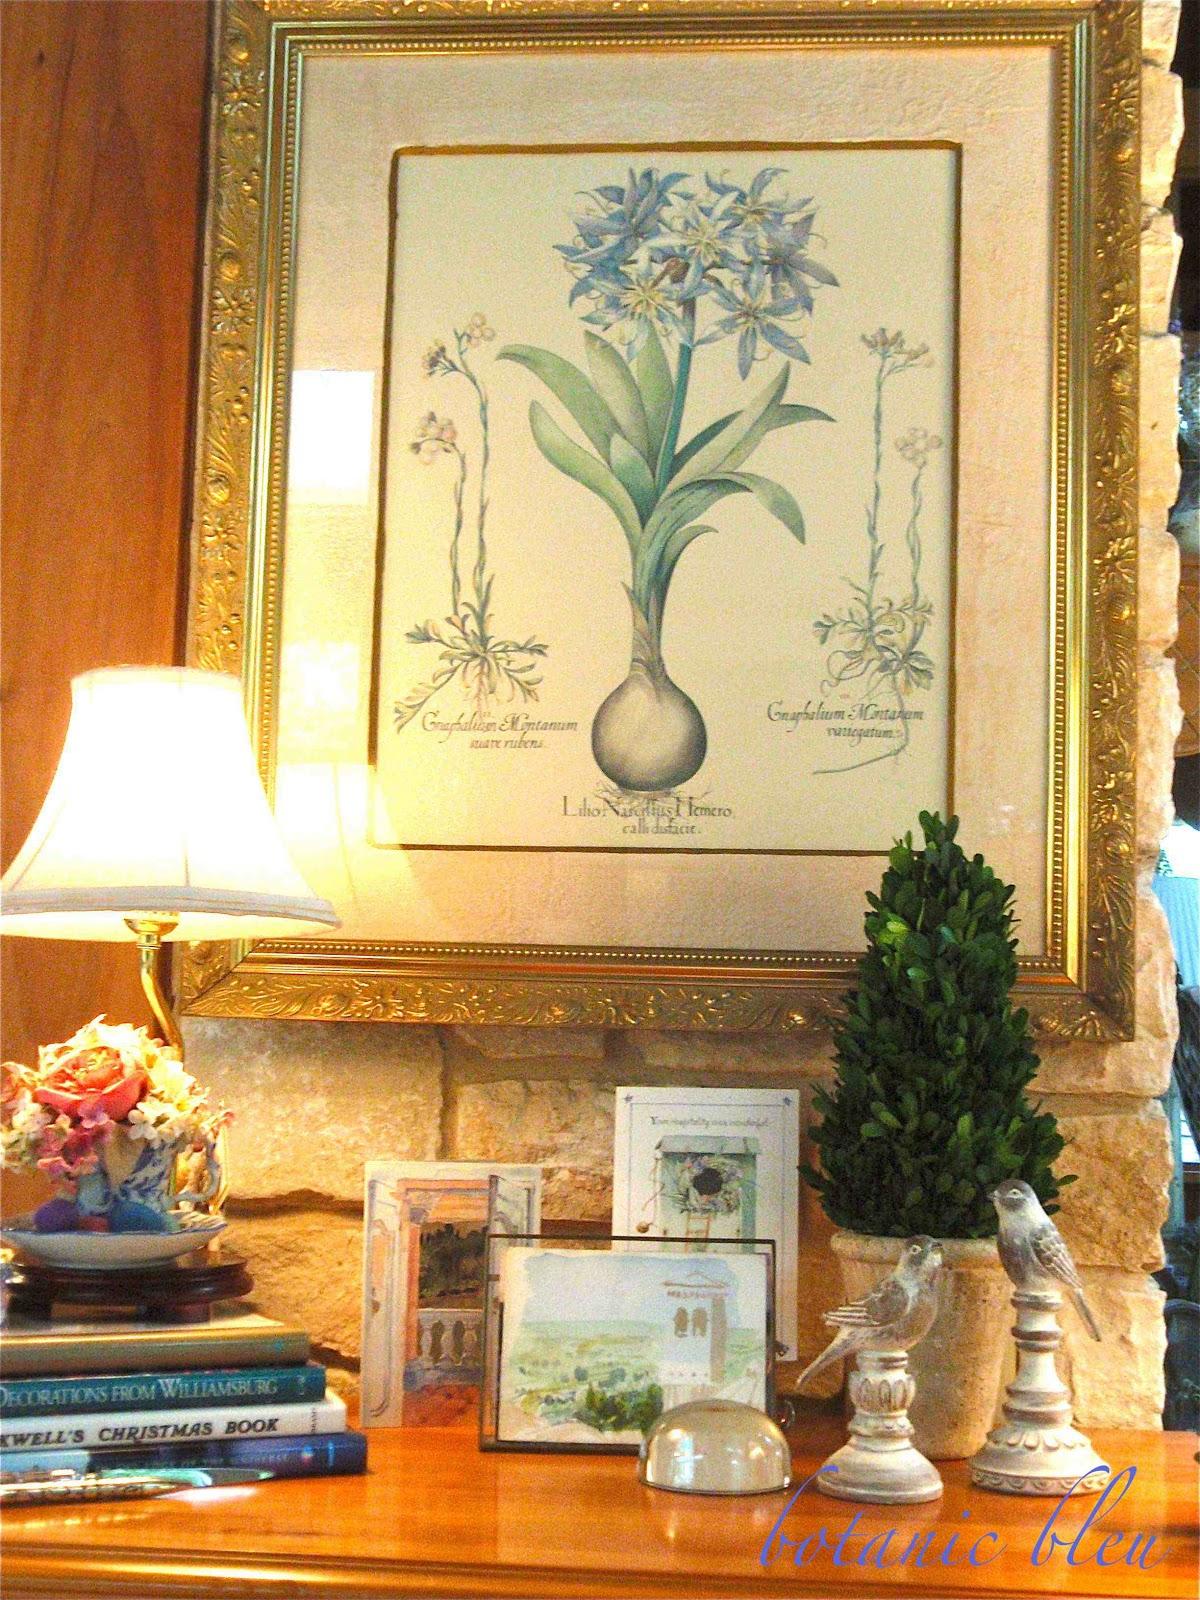 botanic bleu vignette design series 2 theme. Black Bedroom Furniture Sets. Home Design Ideas